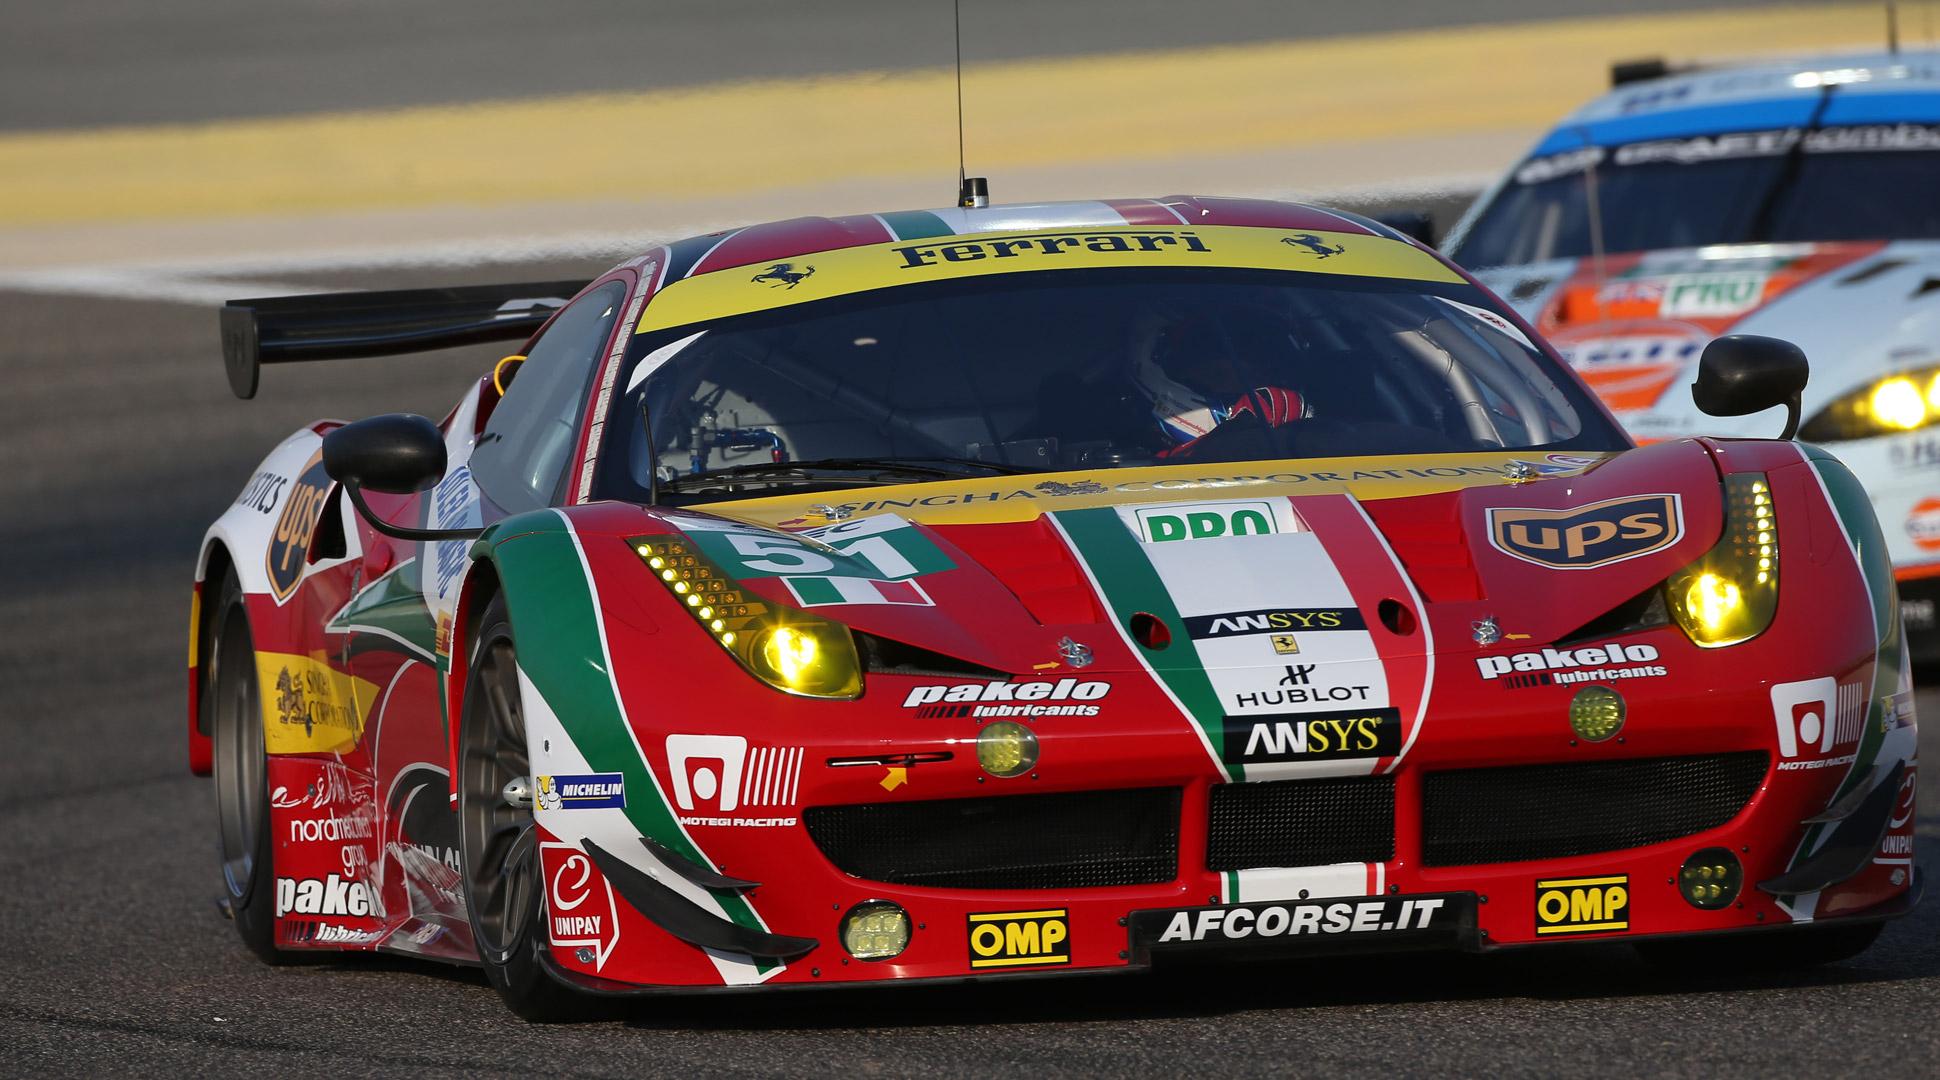 WEC, AF Corse Ferrari's Bruni and Vilander